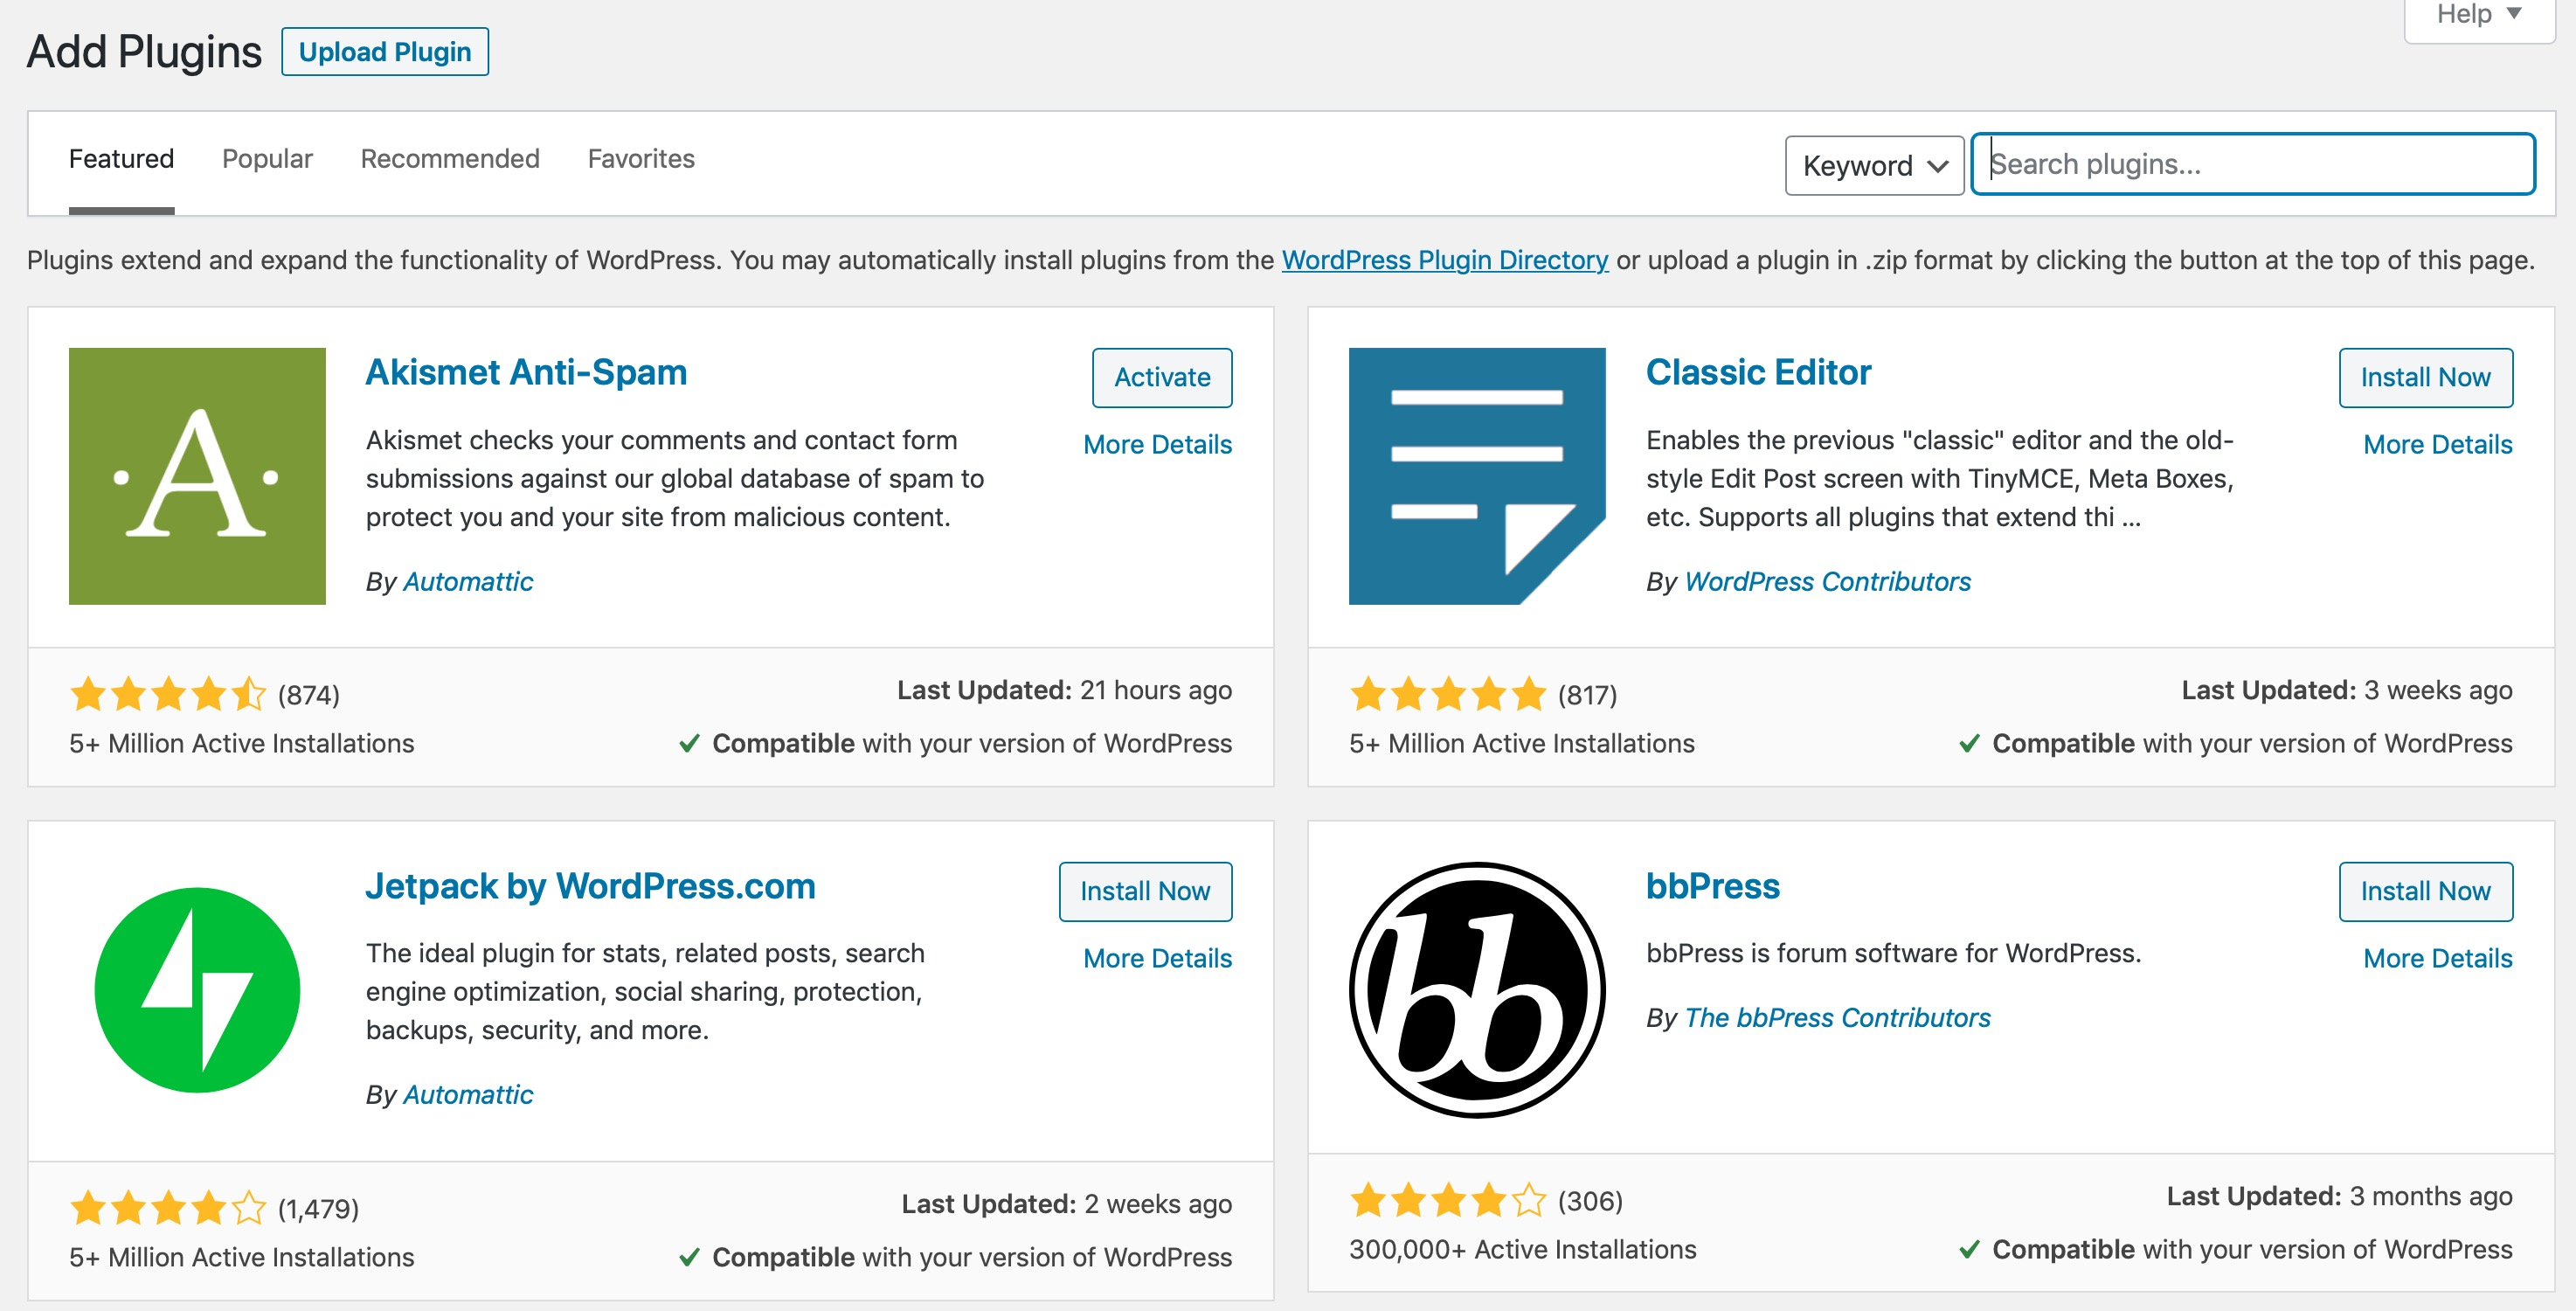 installing bbPress